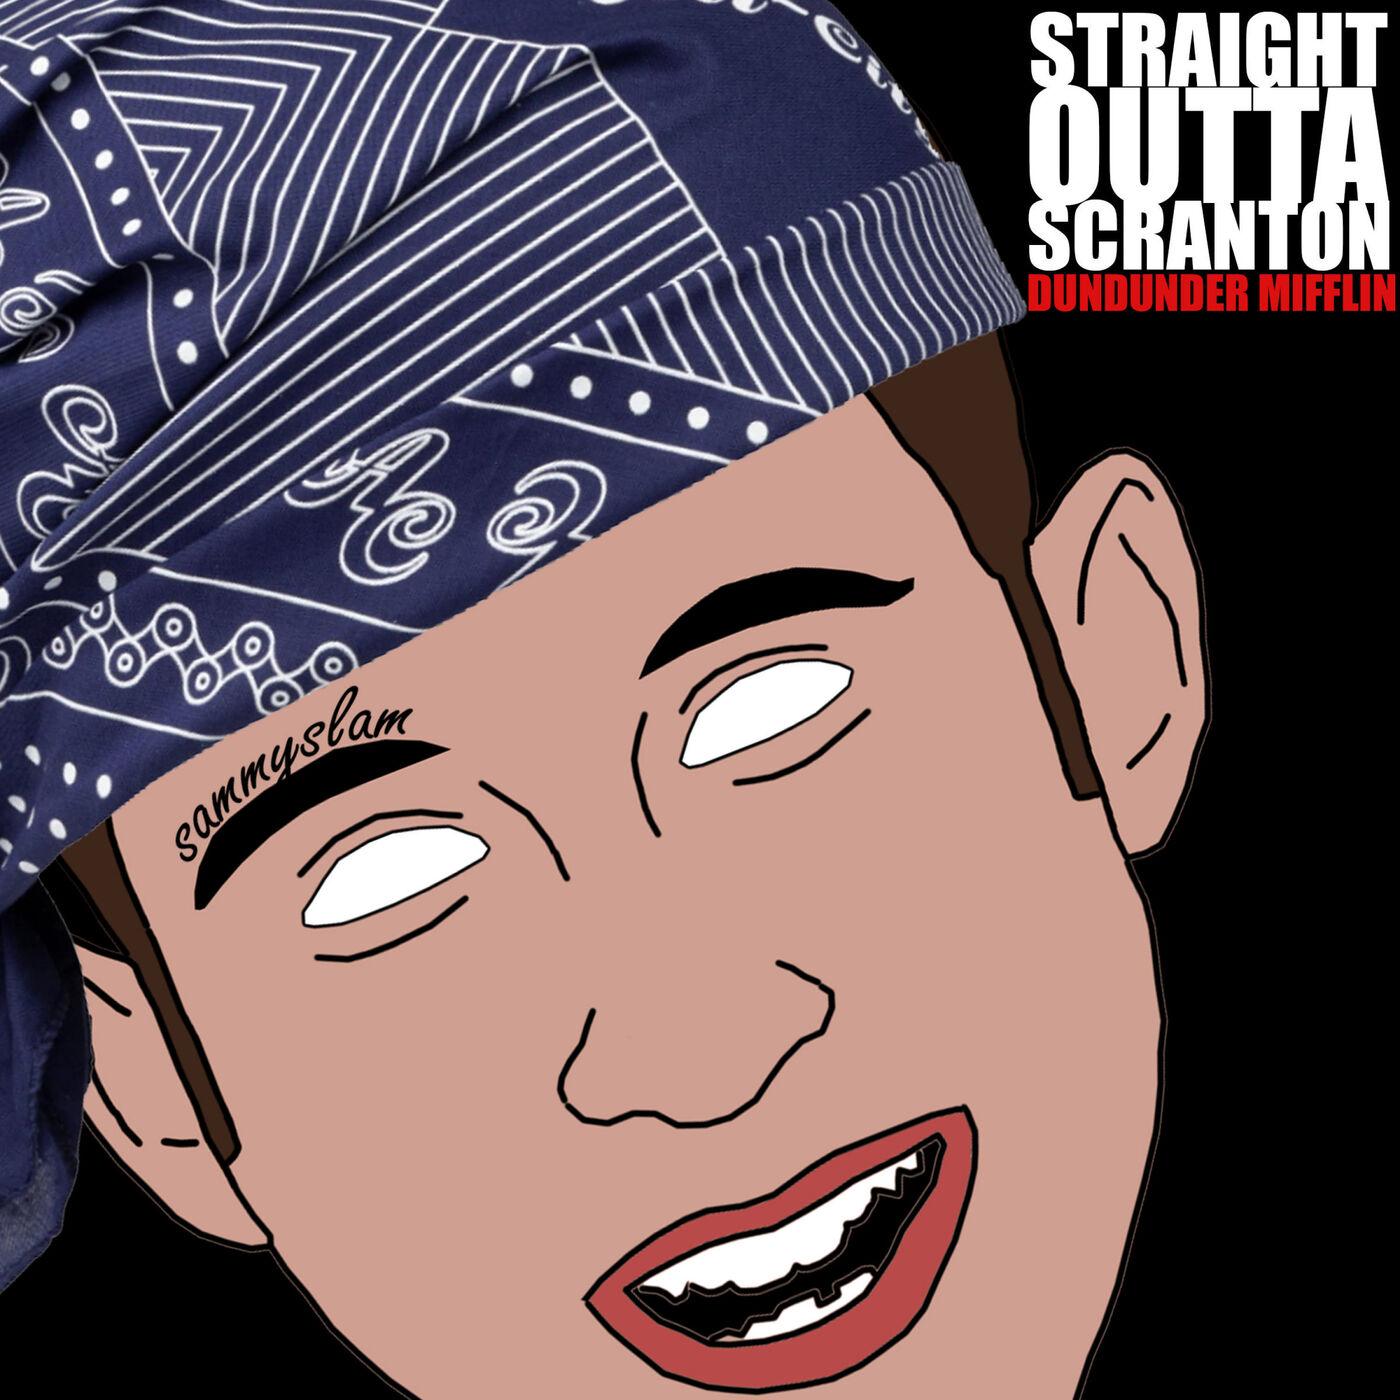 Sammy SlamDance - Dundunder Mifflin: Straight Outta Scranton [single] (2020)